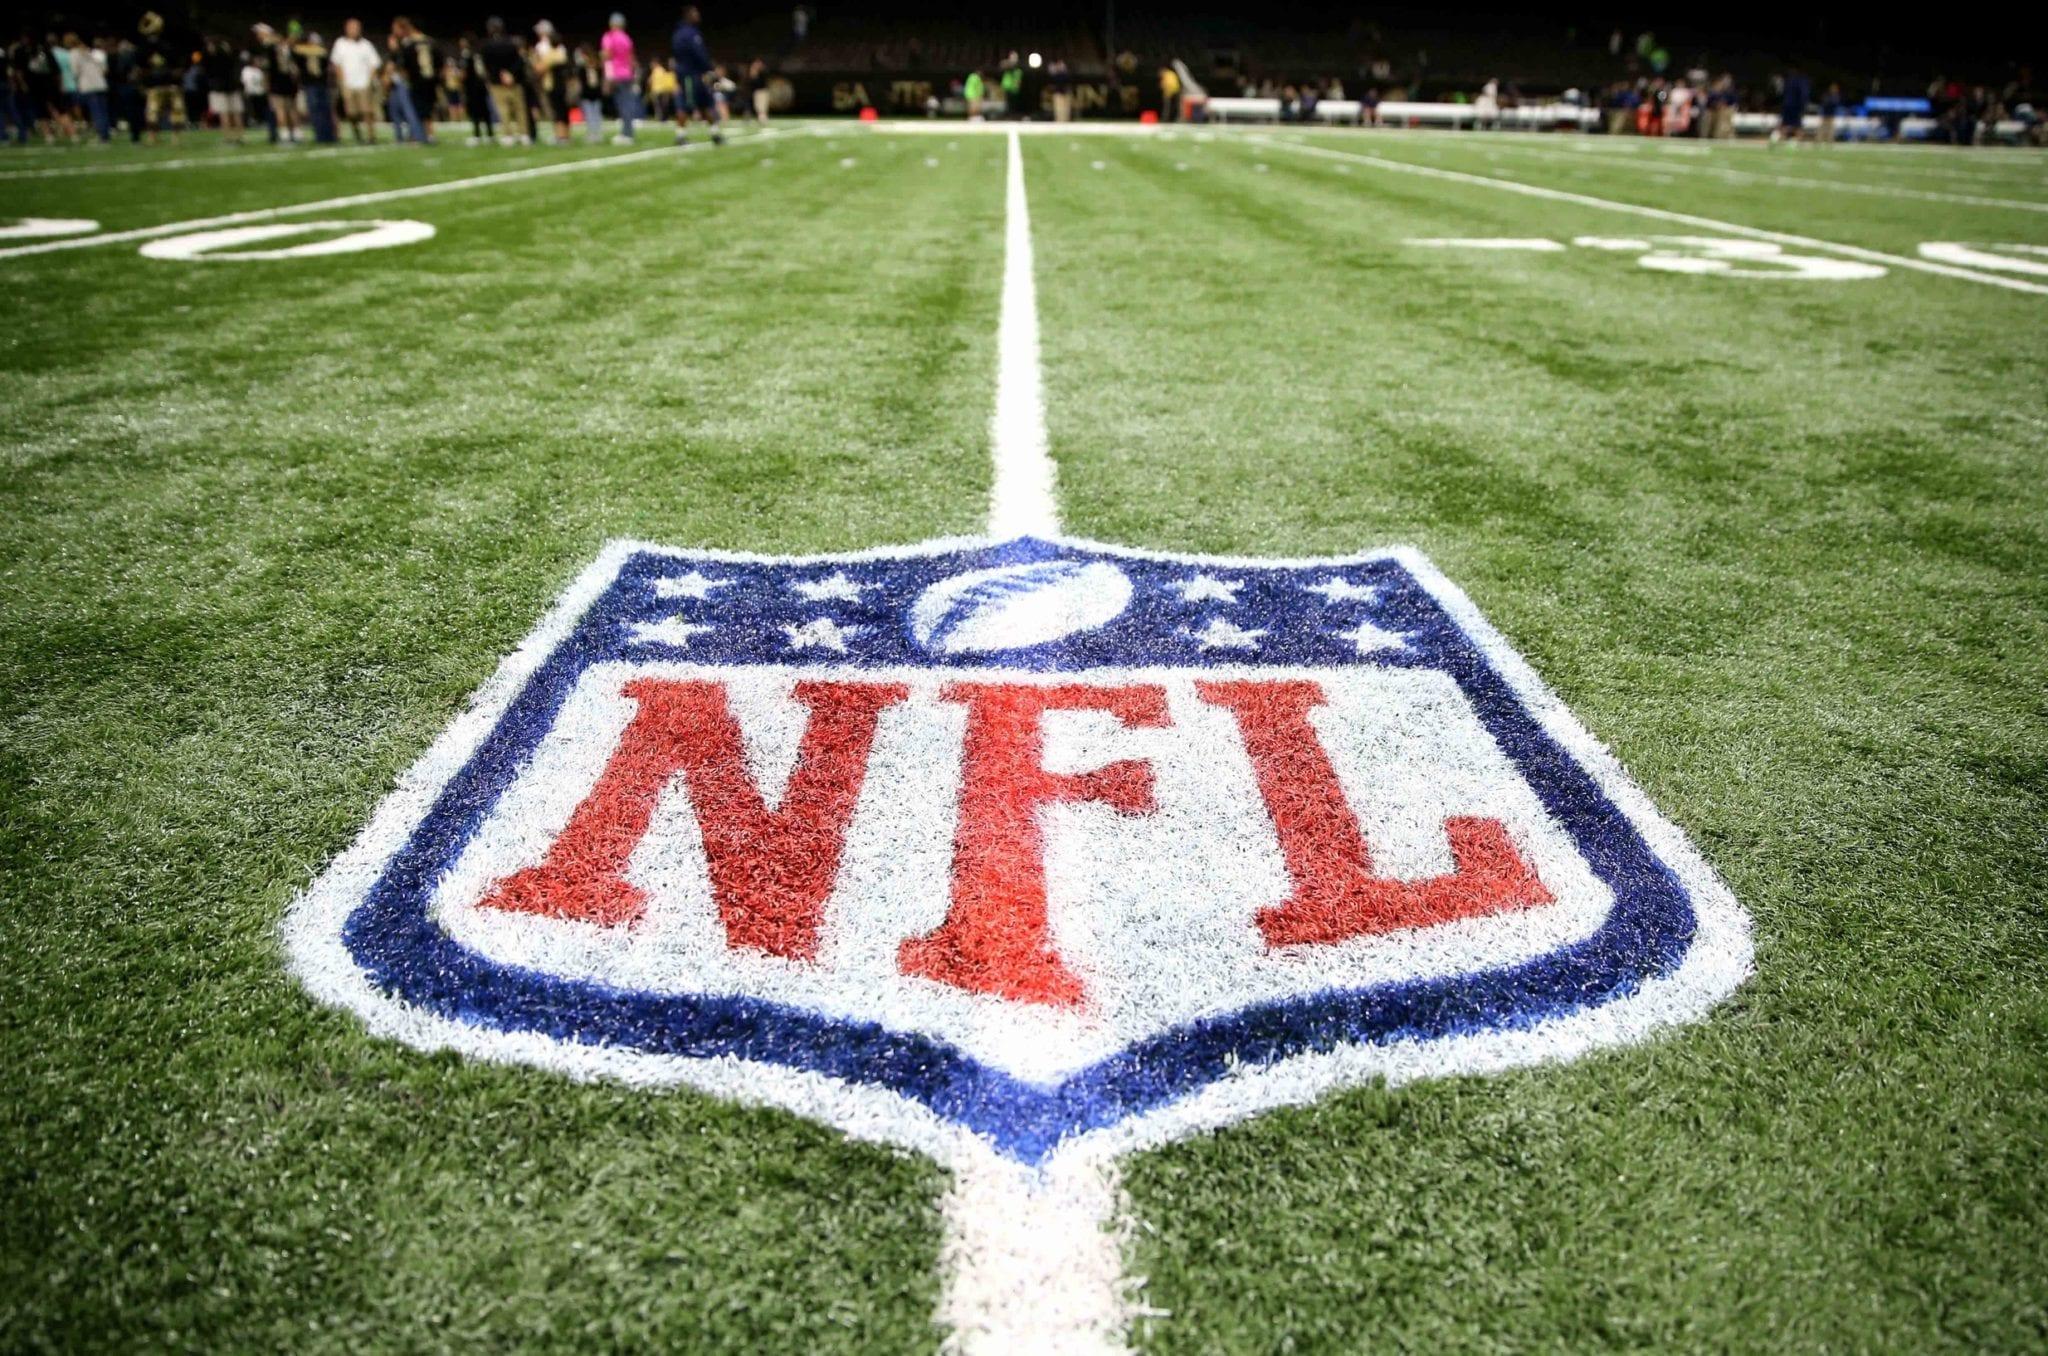 NFL Transactions: Wednesday 8/22 - NFL Trade Rumors 2018-08-22 21:55